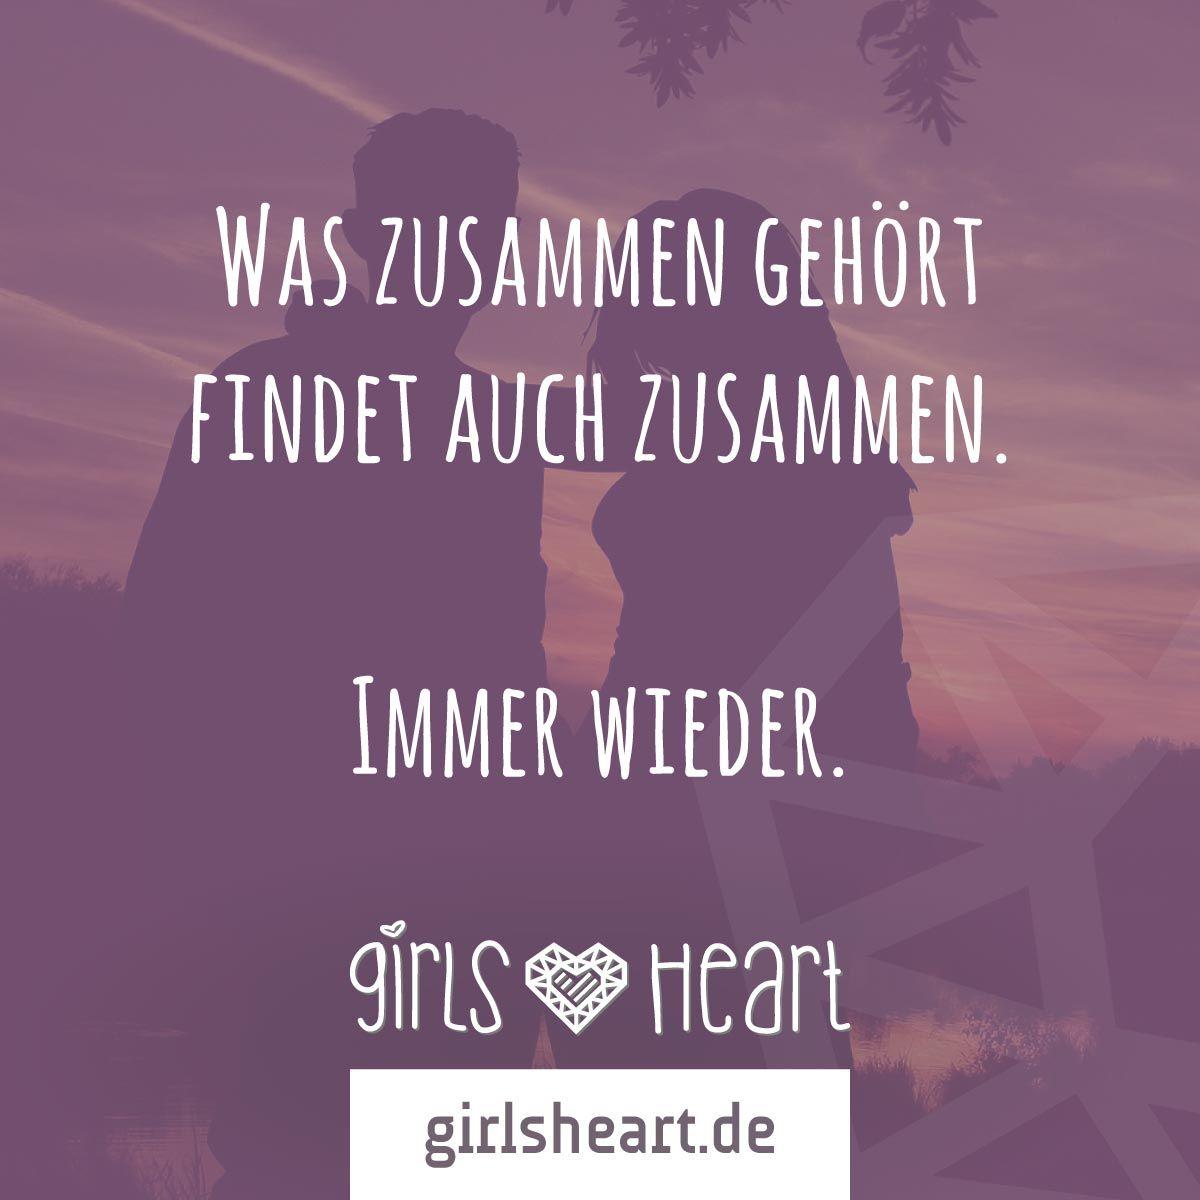 Mehr Sprüche Auf Www Girlsheart De Partnerschaft Liebe